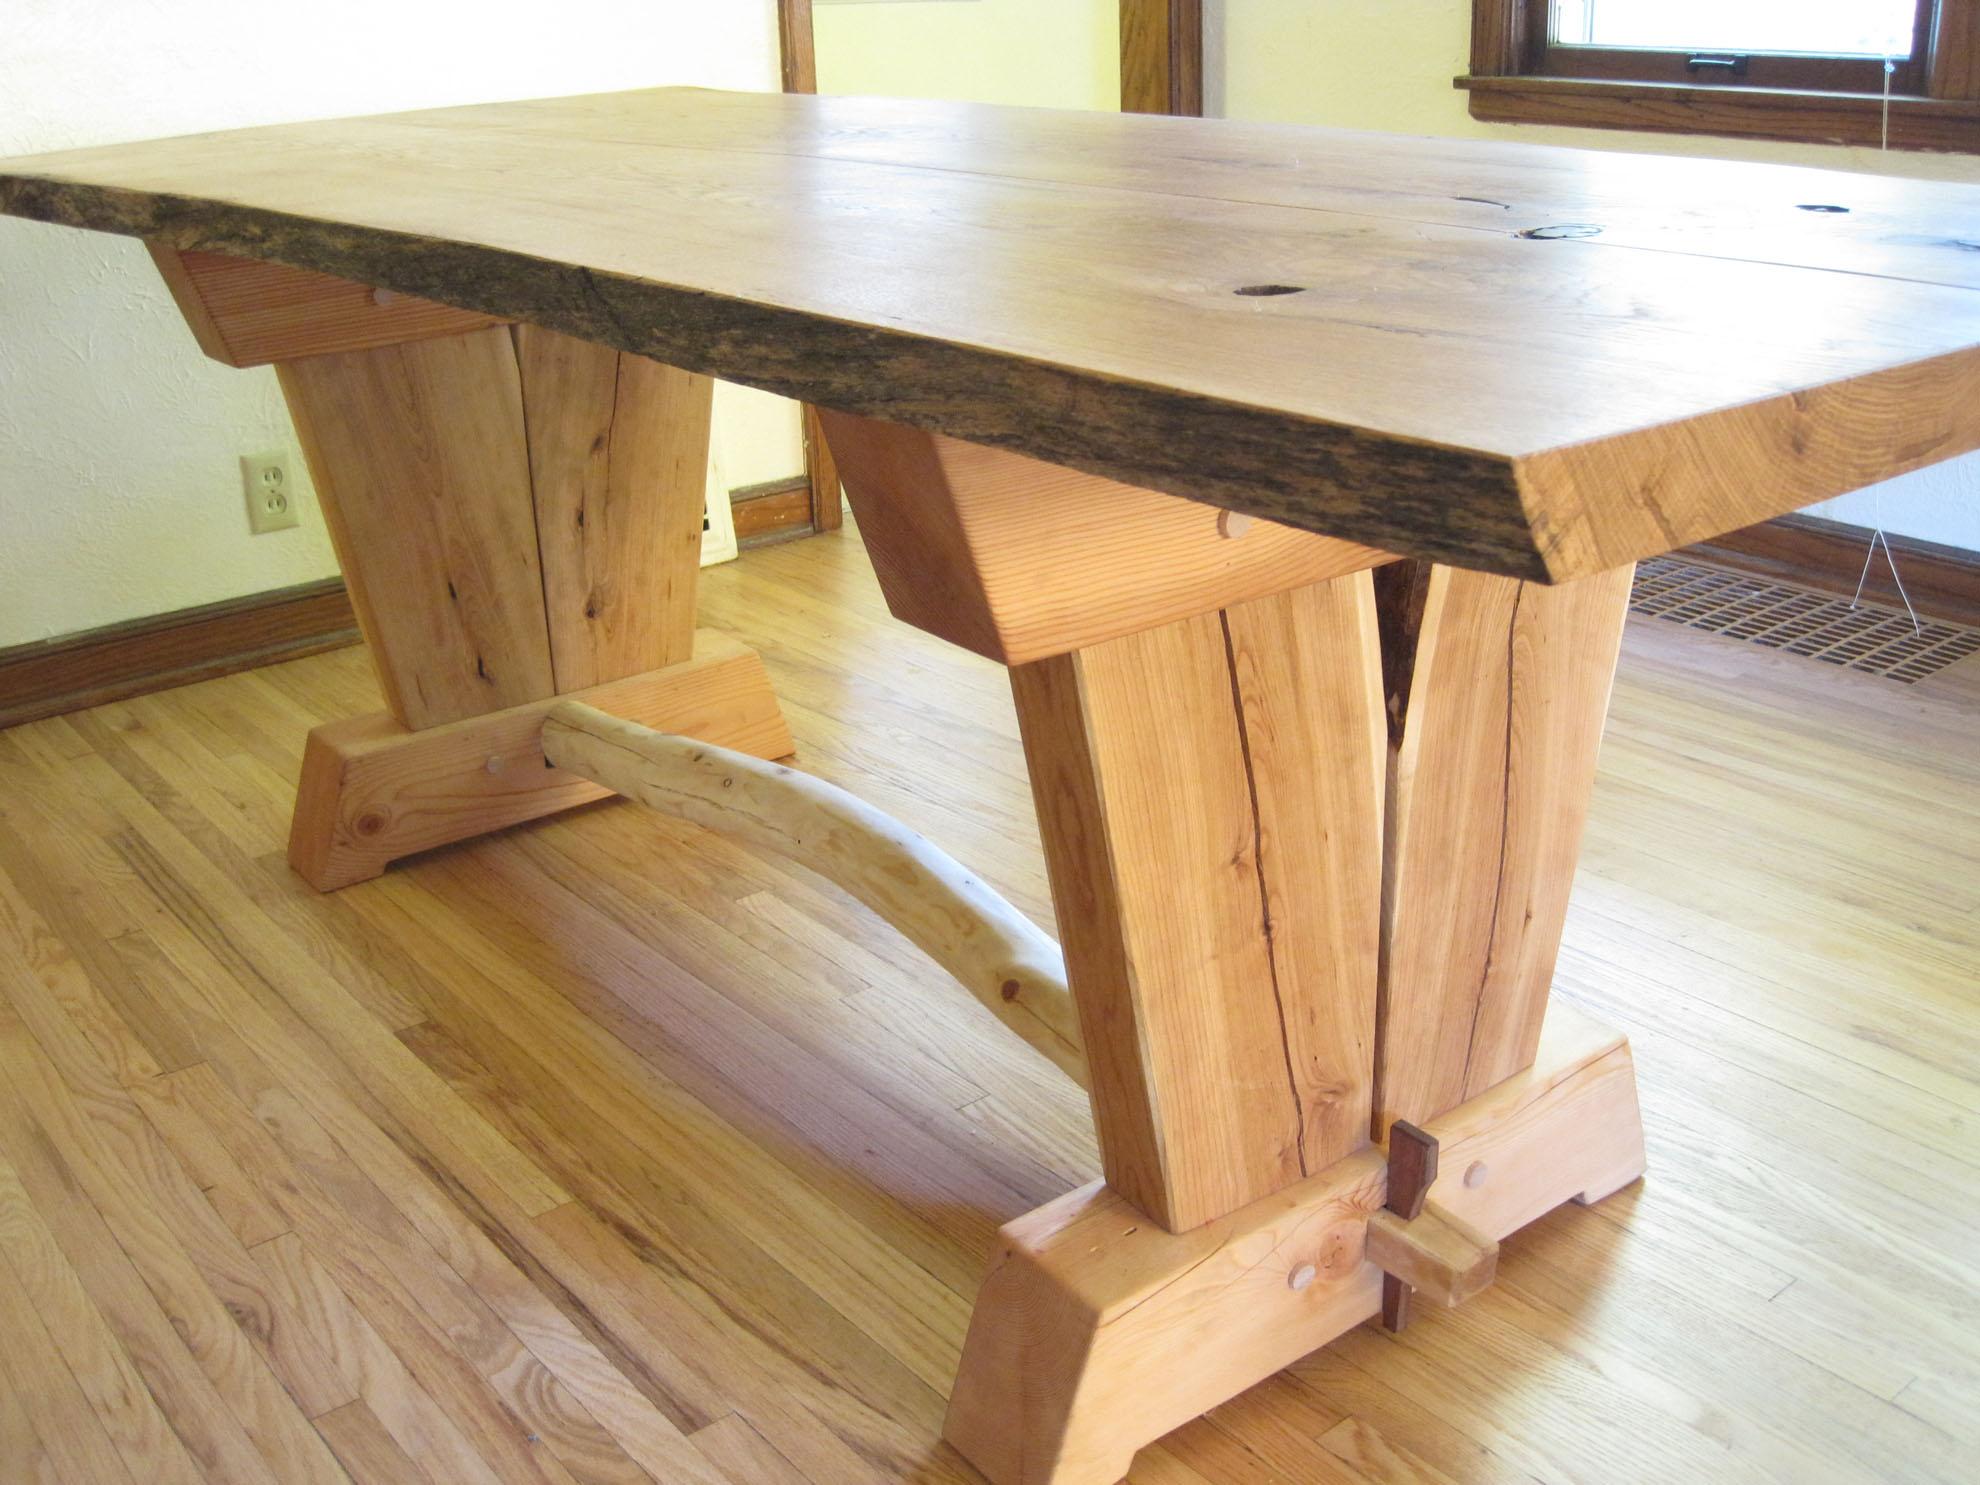 Oak Slab Trestle Table SKOGLUND WOODWORK : table1 from skoglundwoodwork.com size 1980 x 1485 jpeg 361kB